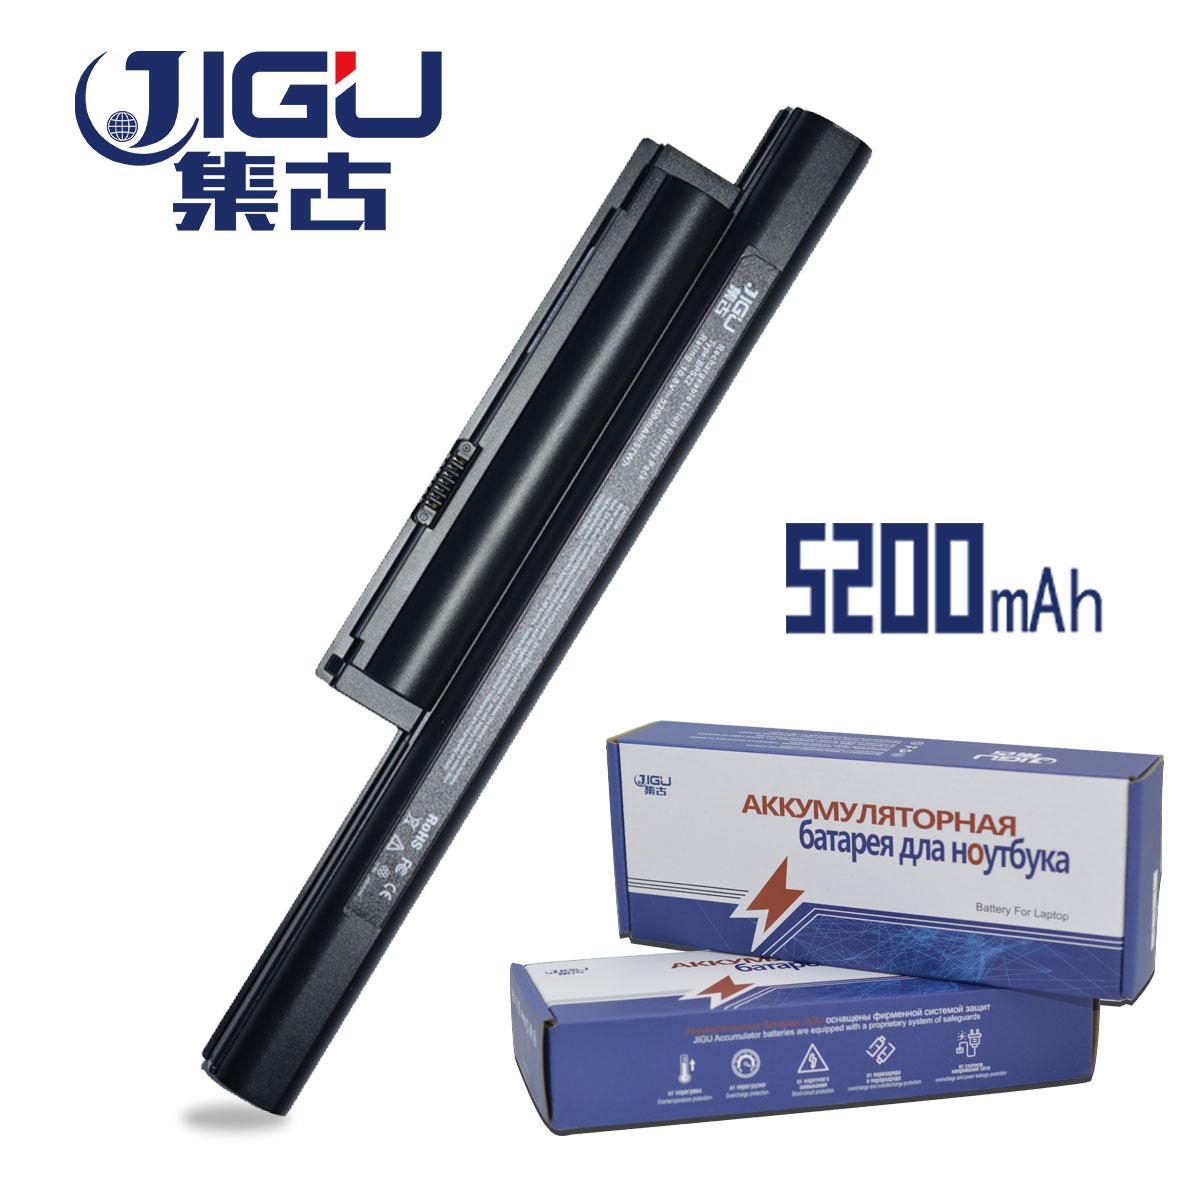 JIGU NO CD Laptop Battery BPS22 VGP-BPS22 VGP-BPL22 VGP-BPS22A VGP-BPS22/A Notebook Battery For SONY VAIO E Series japanese cell kingsener vgp bps22 laptop battery for sony vaio vgp bps22a vpc ea1 ea18 ea16 ea31 pcg 71212t 71211t 61211t 61212t